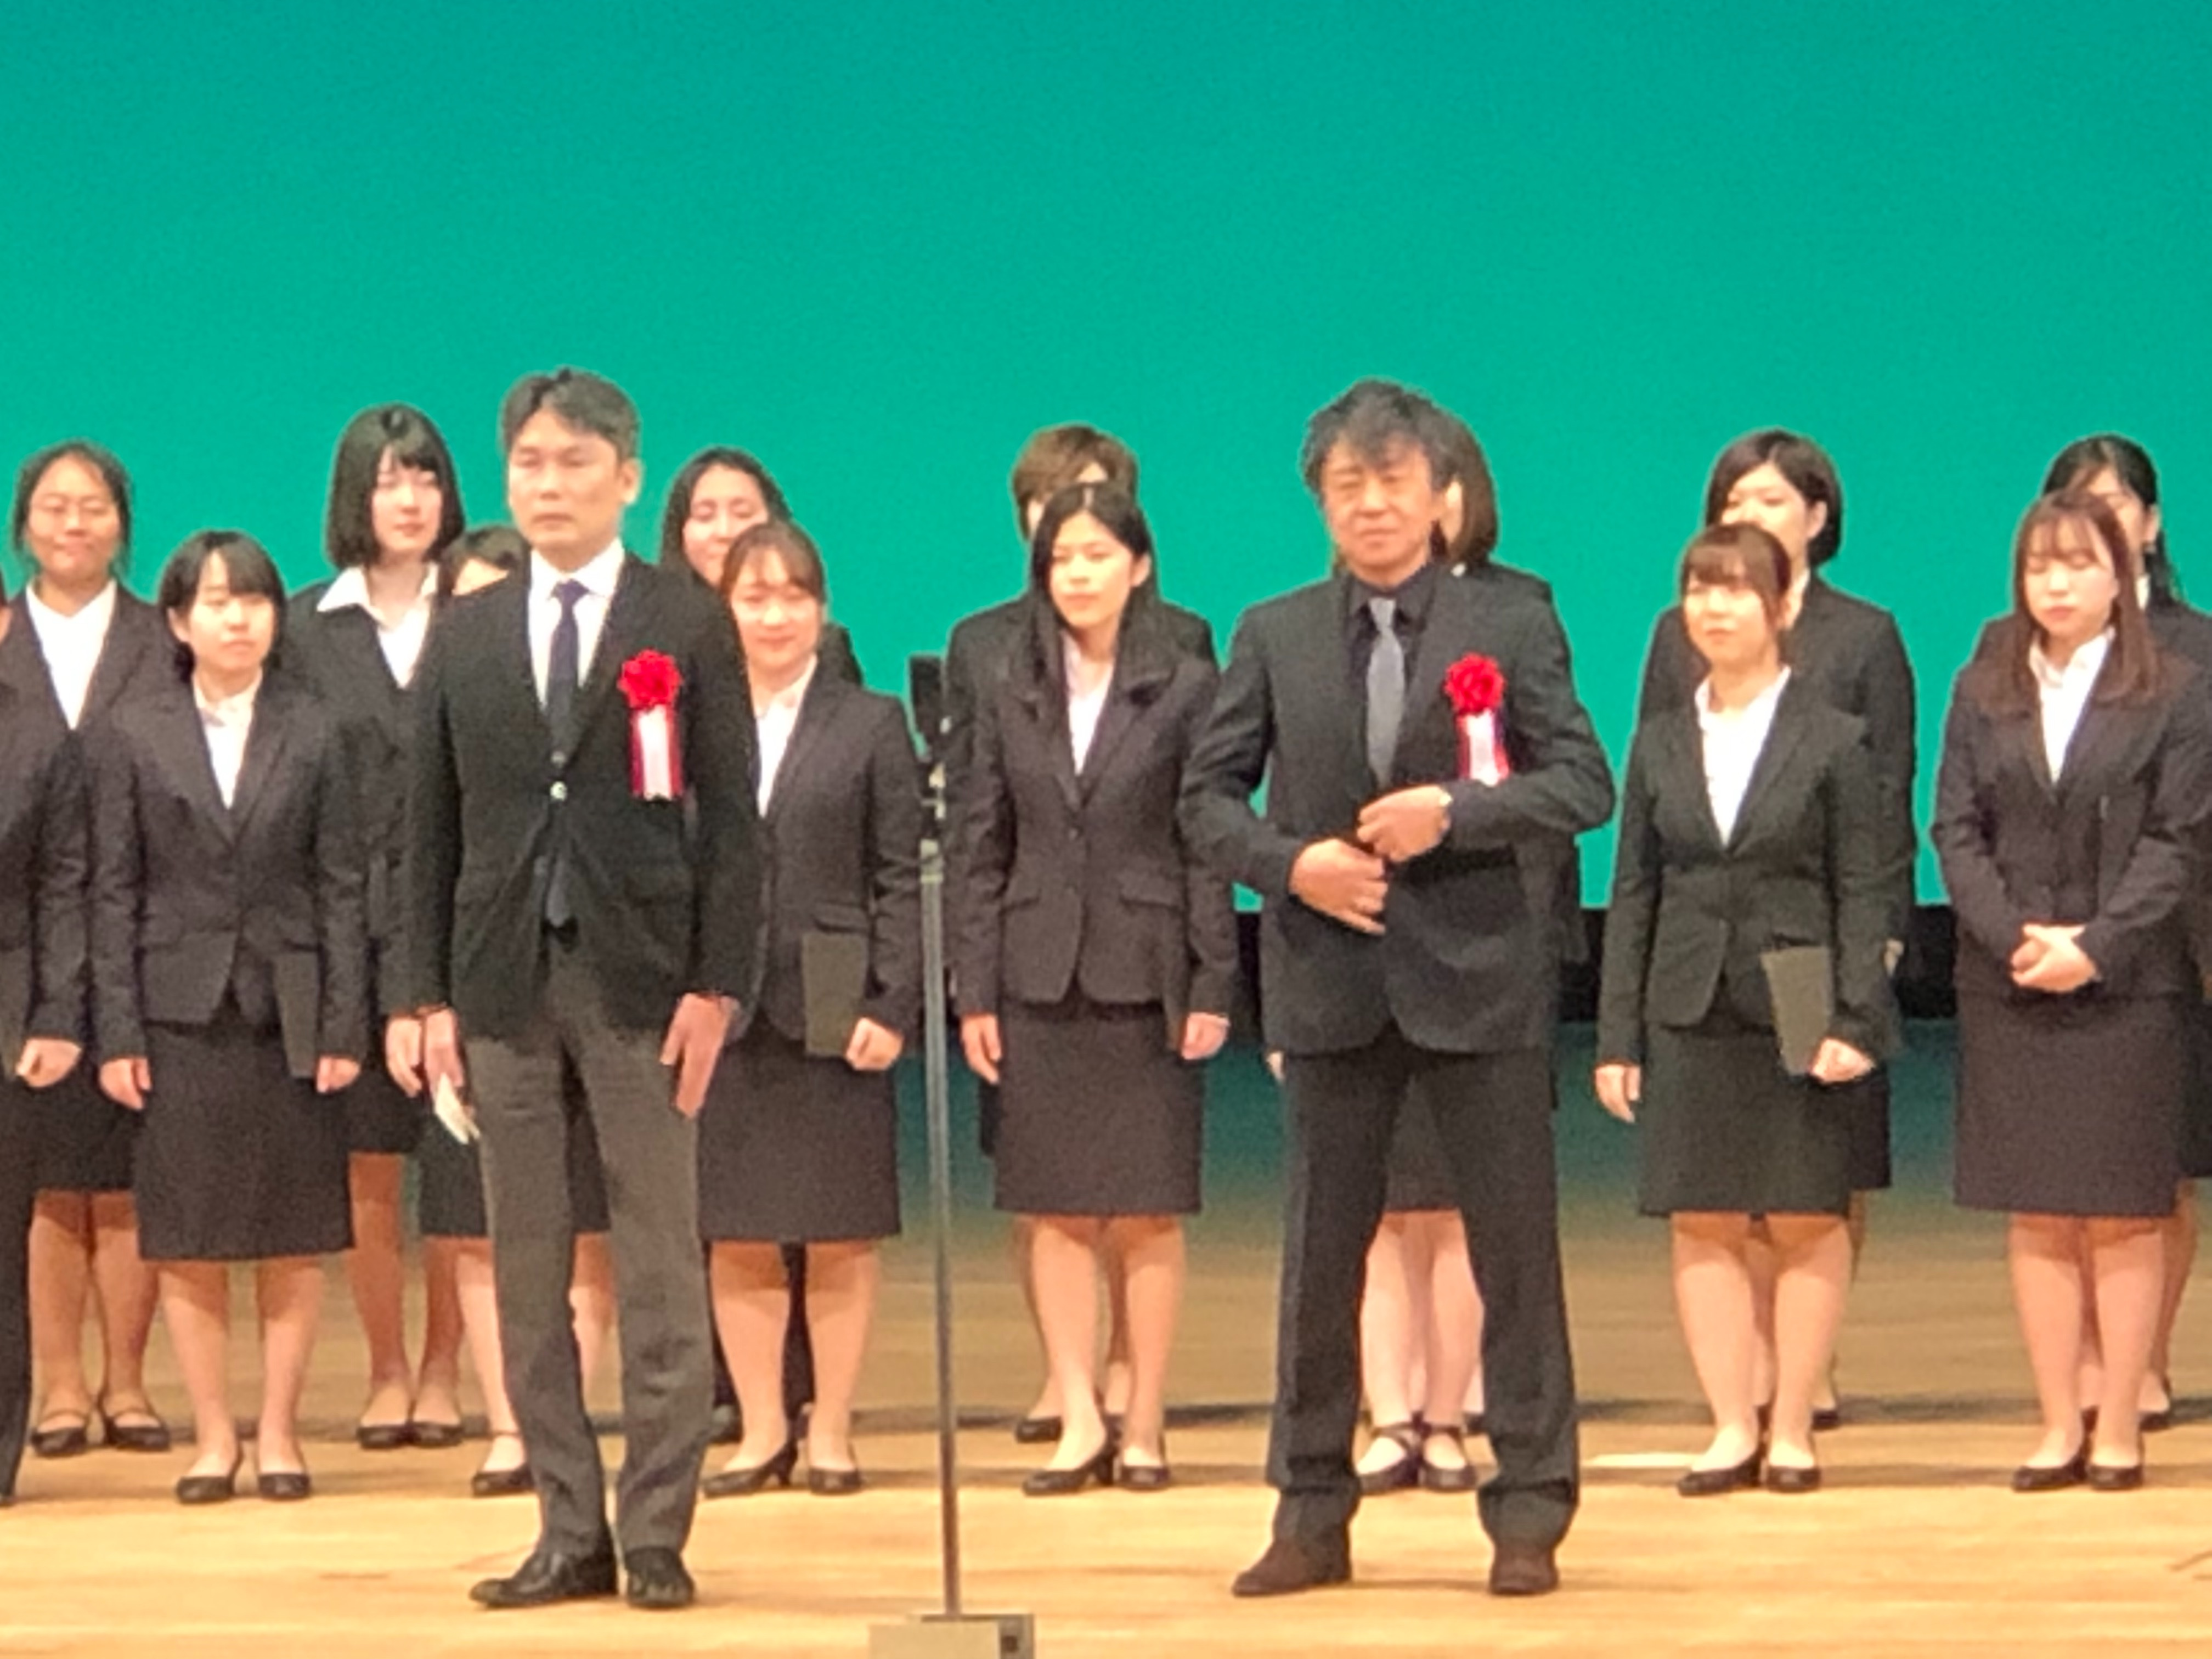 f:id:masanori-kato1972:20190405185428j:image